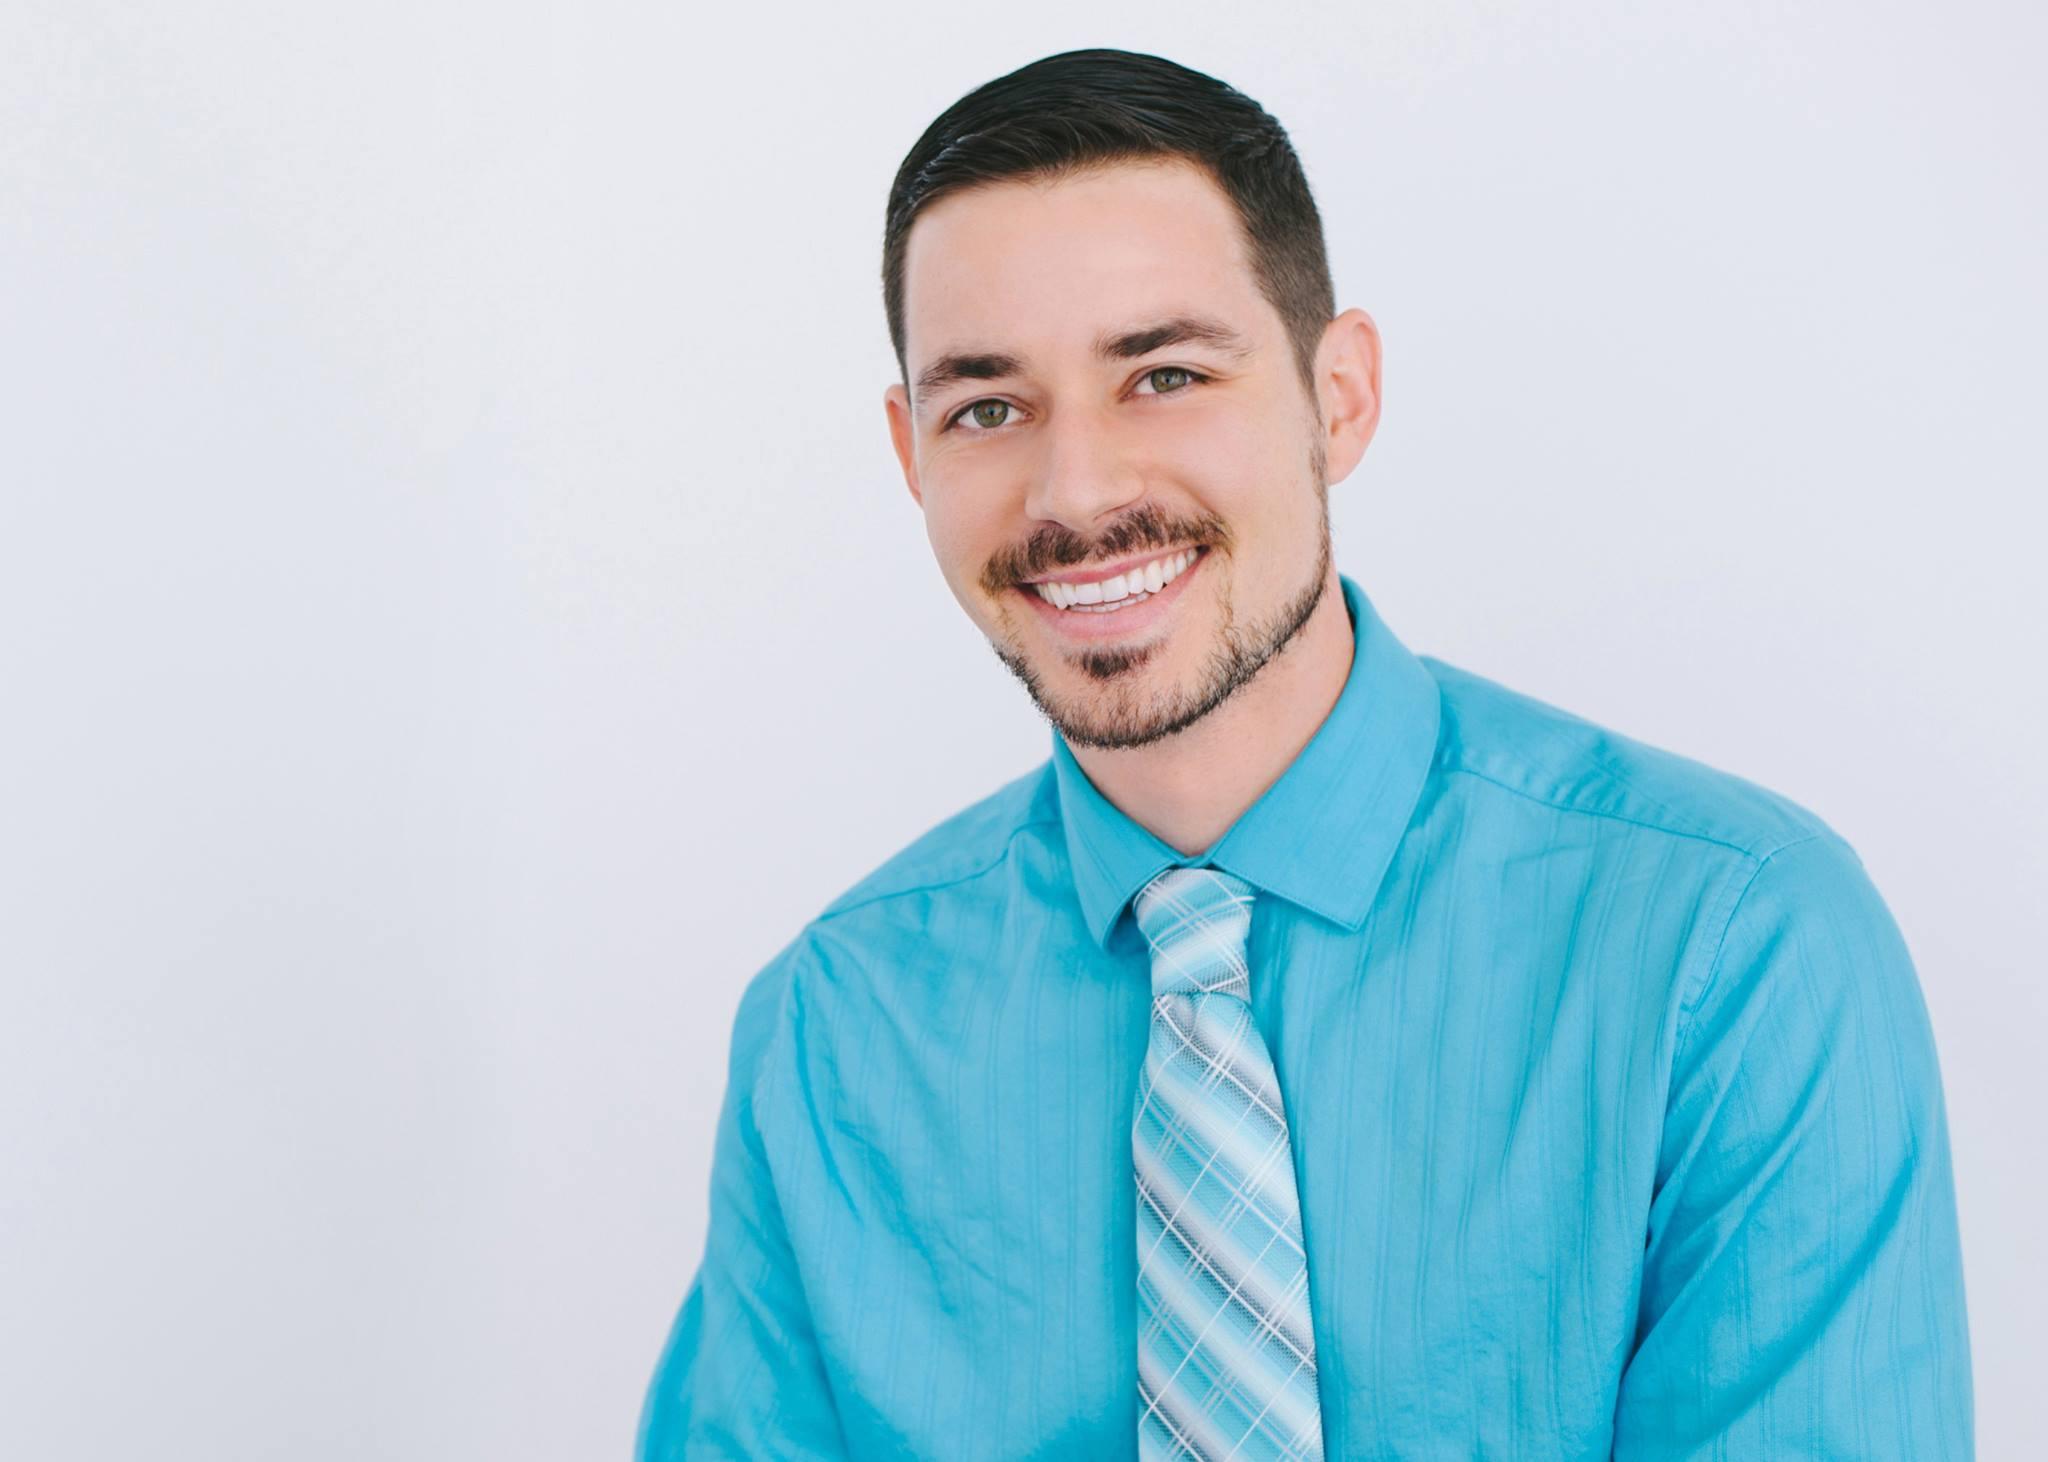 Meet Dr. Ryan T. Johnson